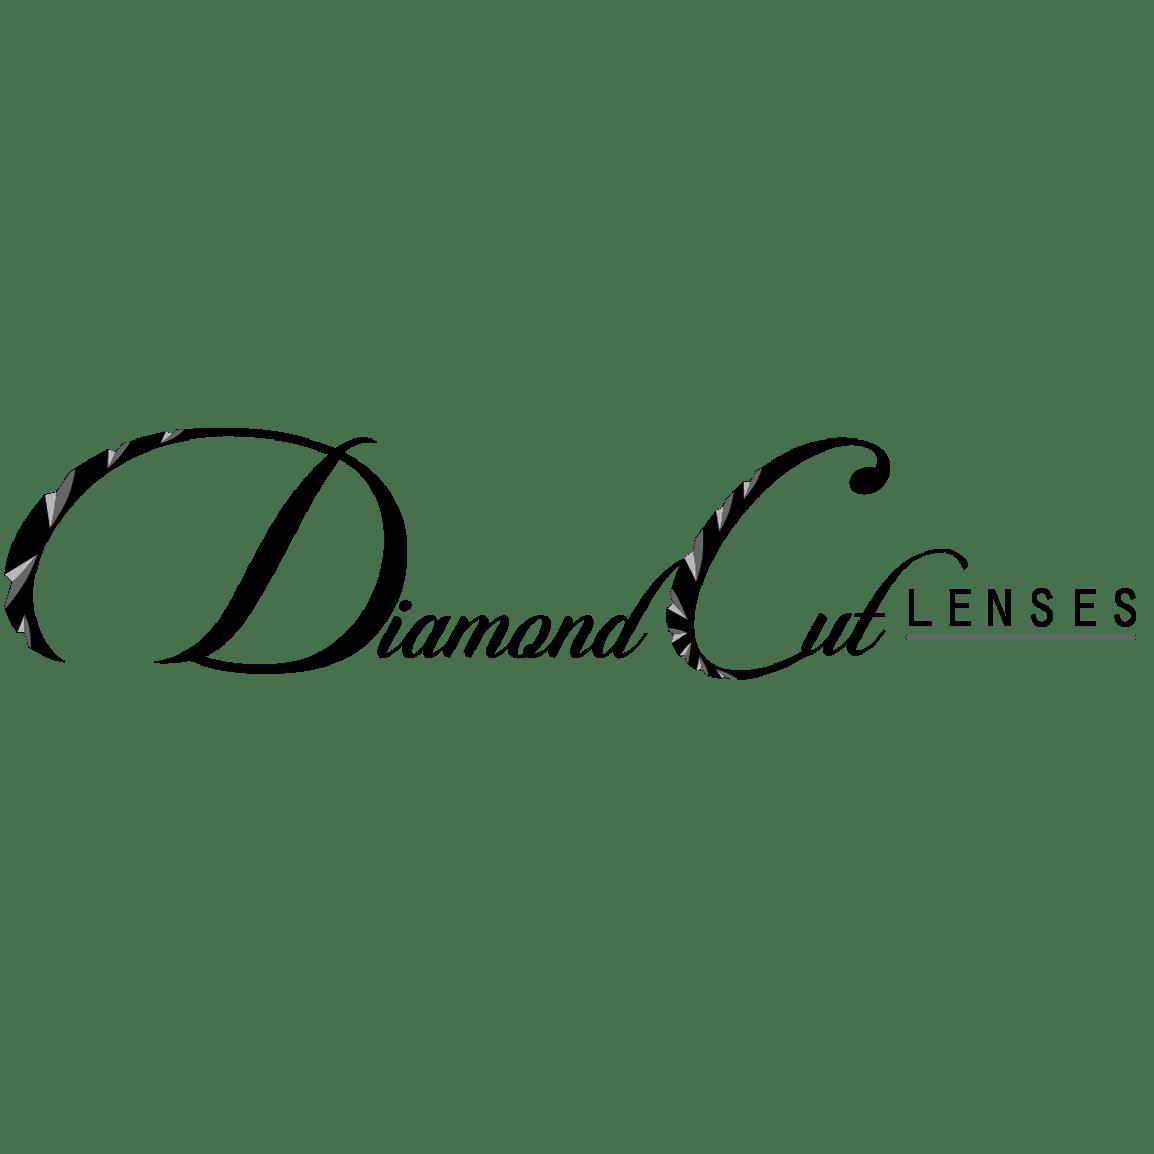 Diamond Cut Lenses